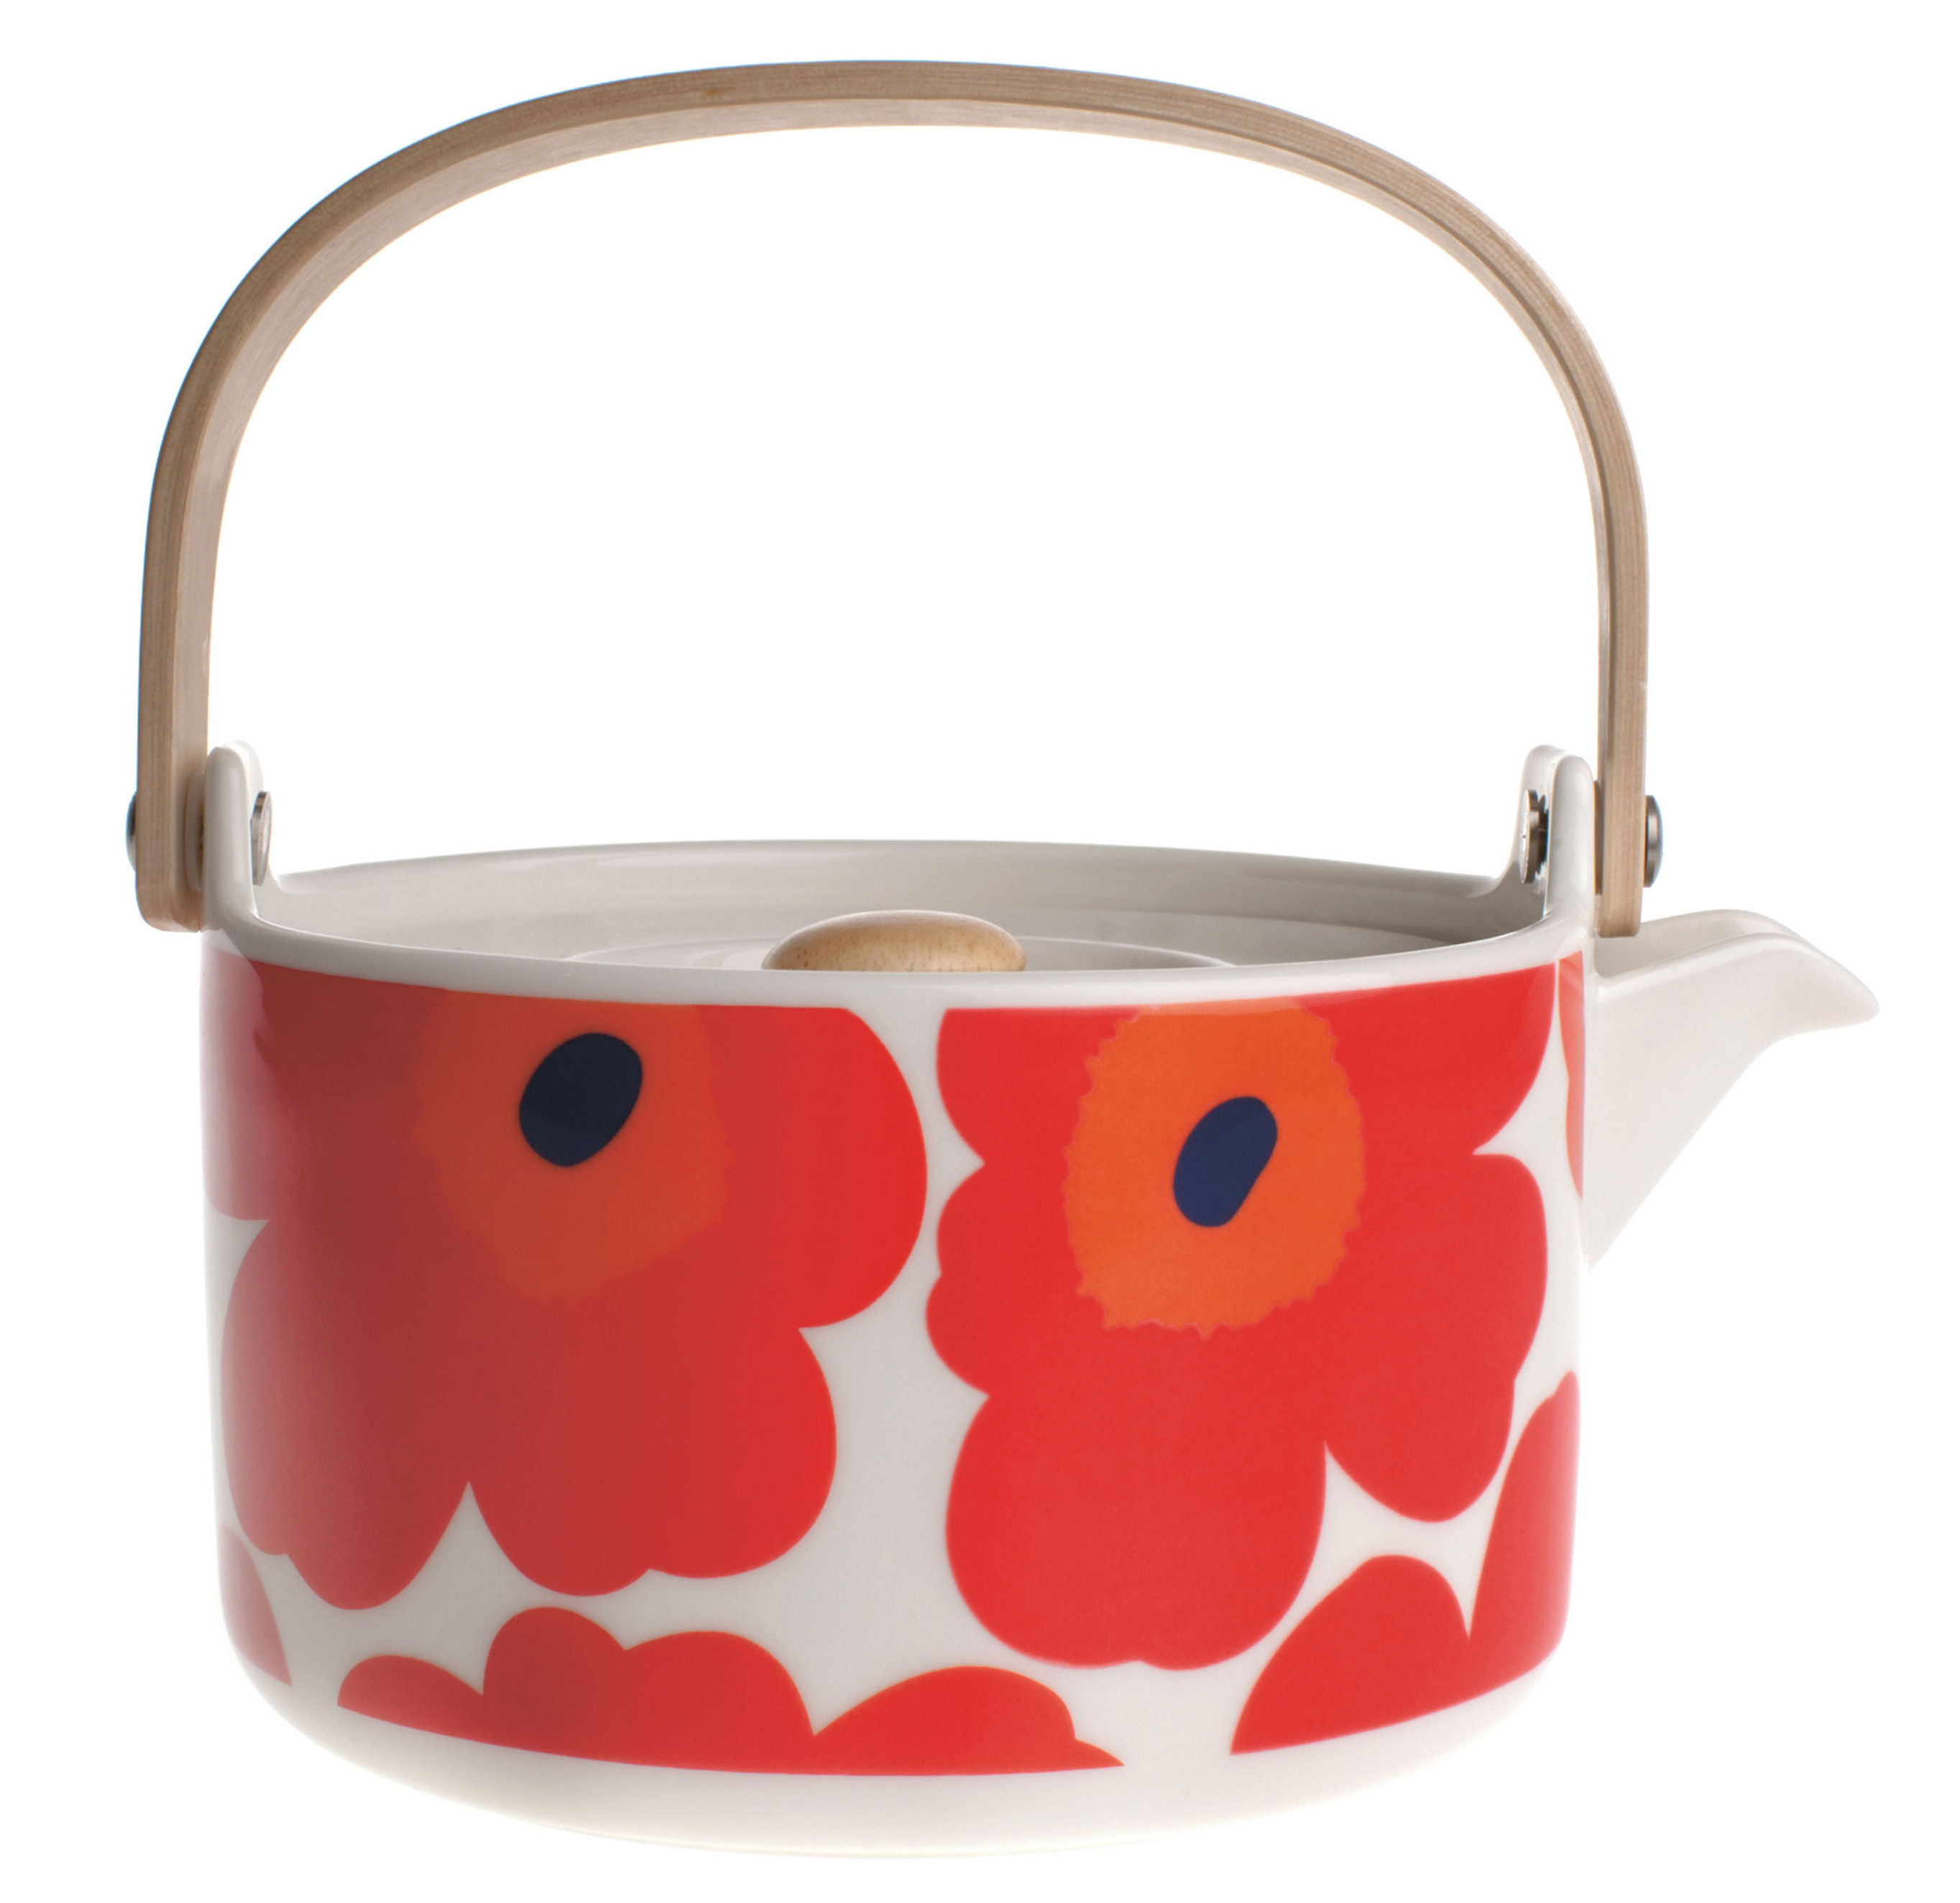 Tableware - Tea & Coffee Accessories - Unikko Teapot by Marimekko - Unikko - Red & white - Sandstone